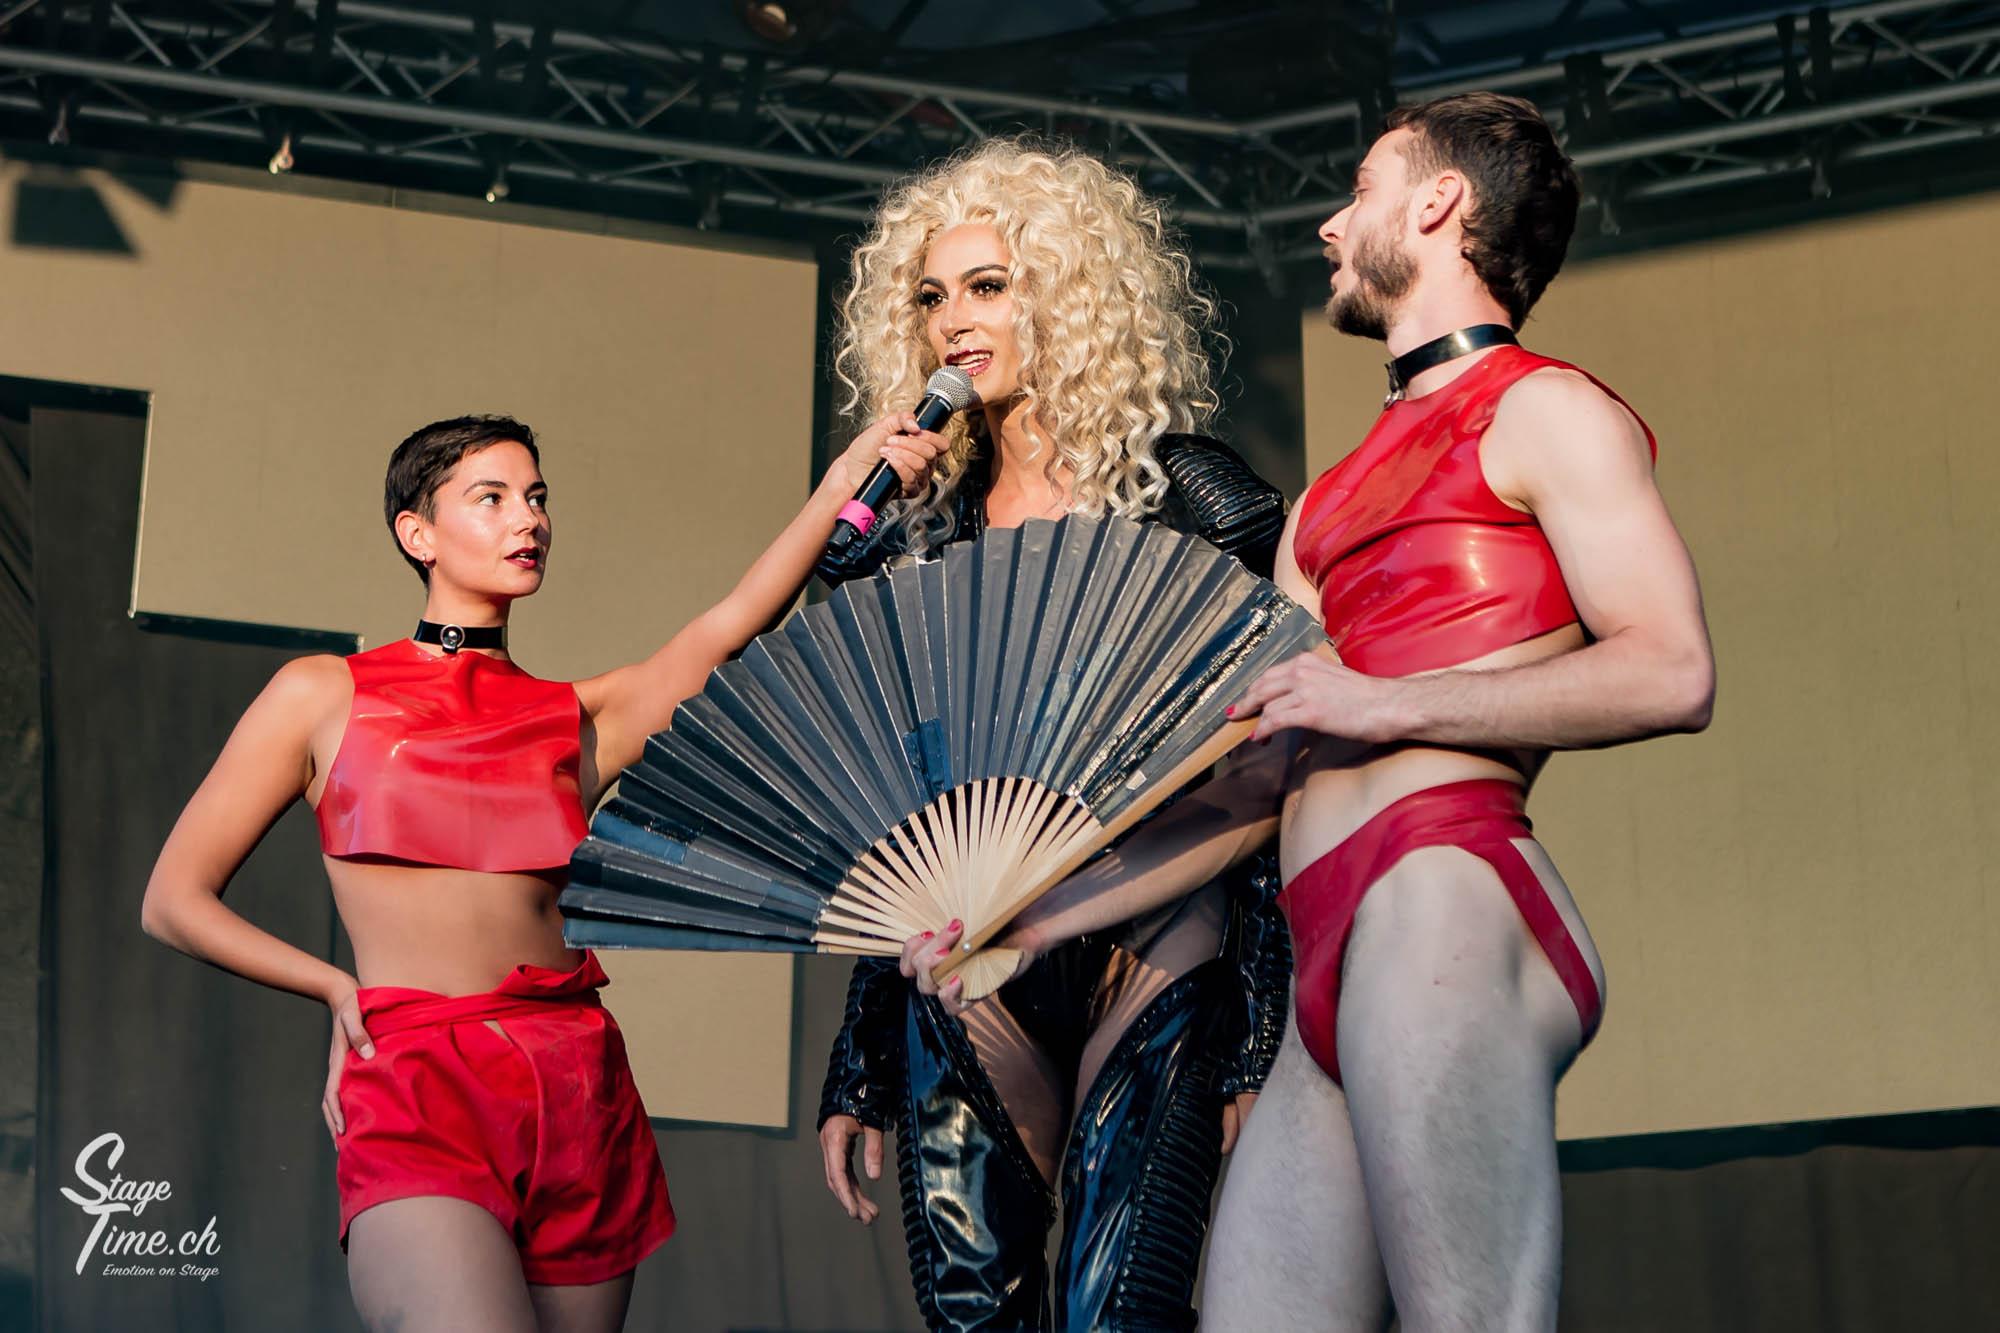 Zurich_Pride_Festival_2018___📷_Christoph_Gurtner___stagetime.ch-21